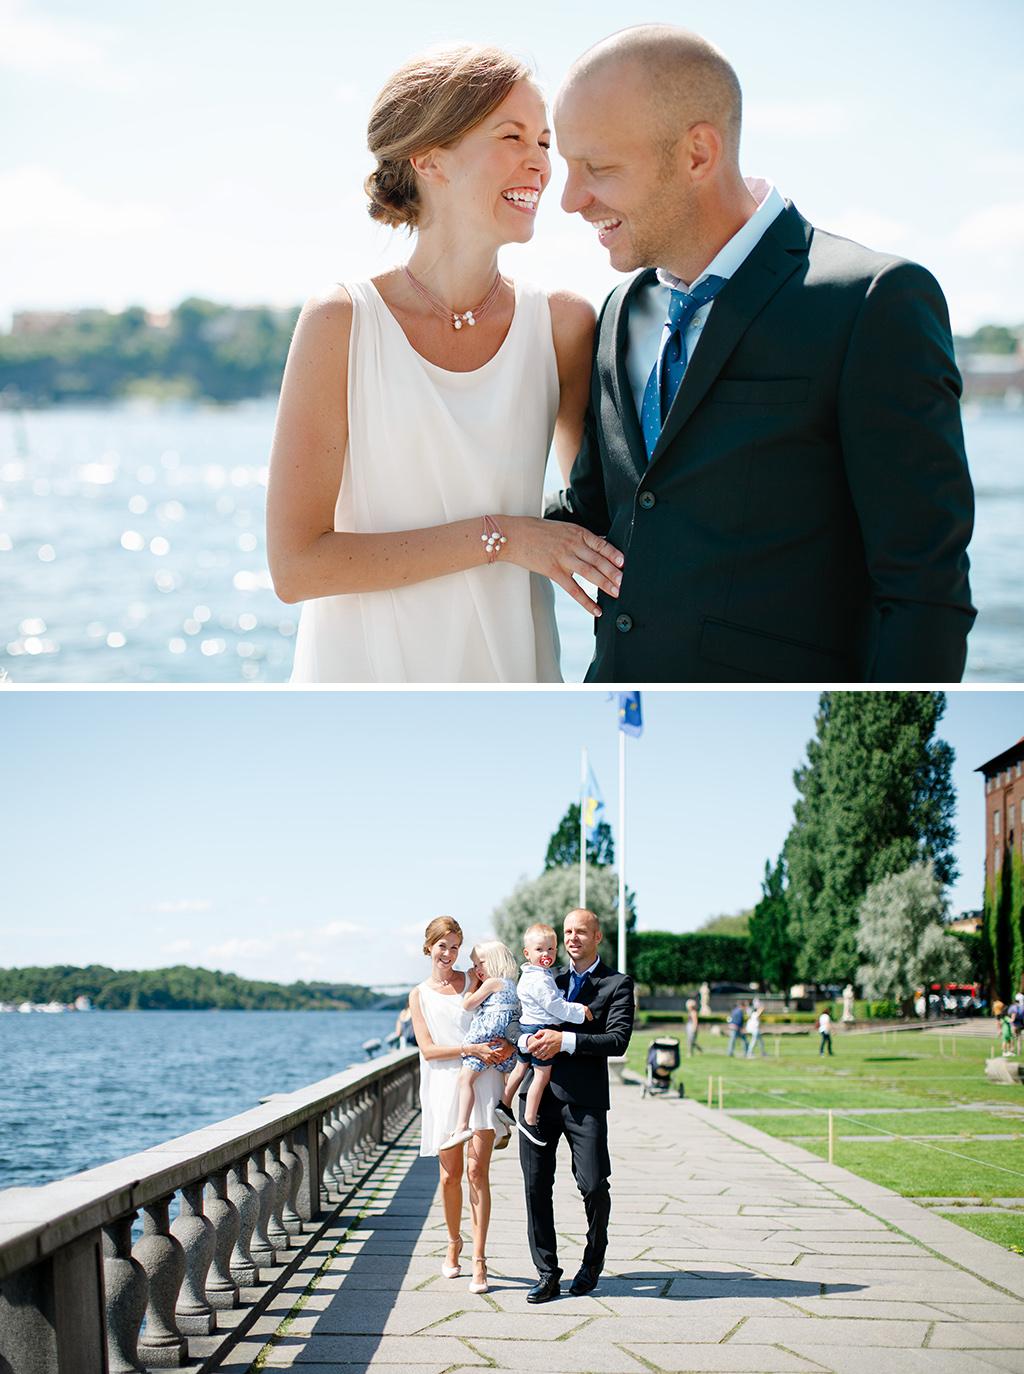 Familjefotograf-Stockholm-Vigsel-i-stadshuset-2.jpg